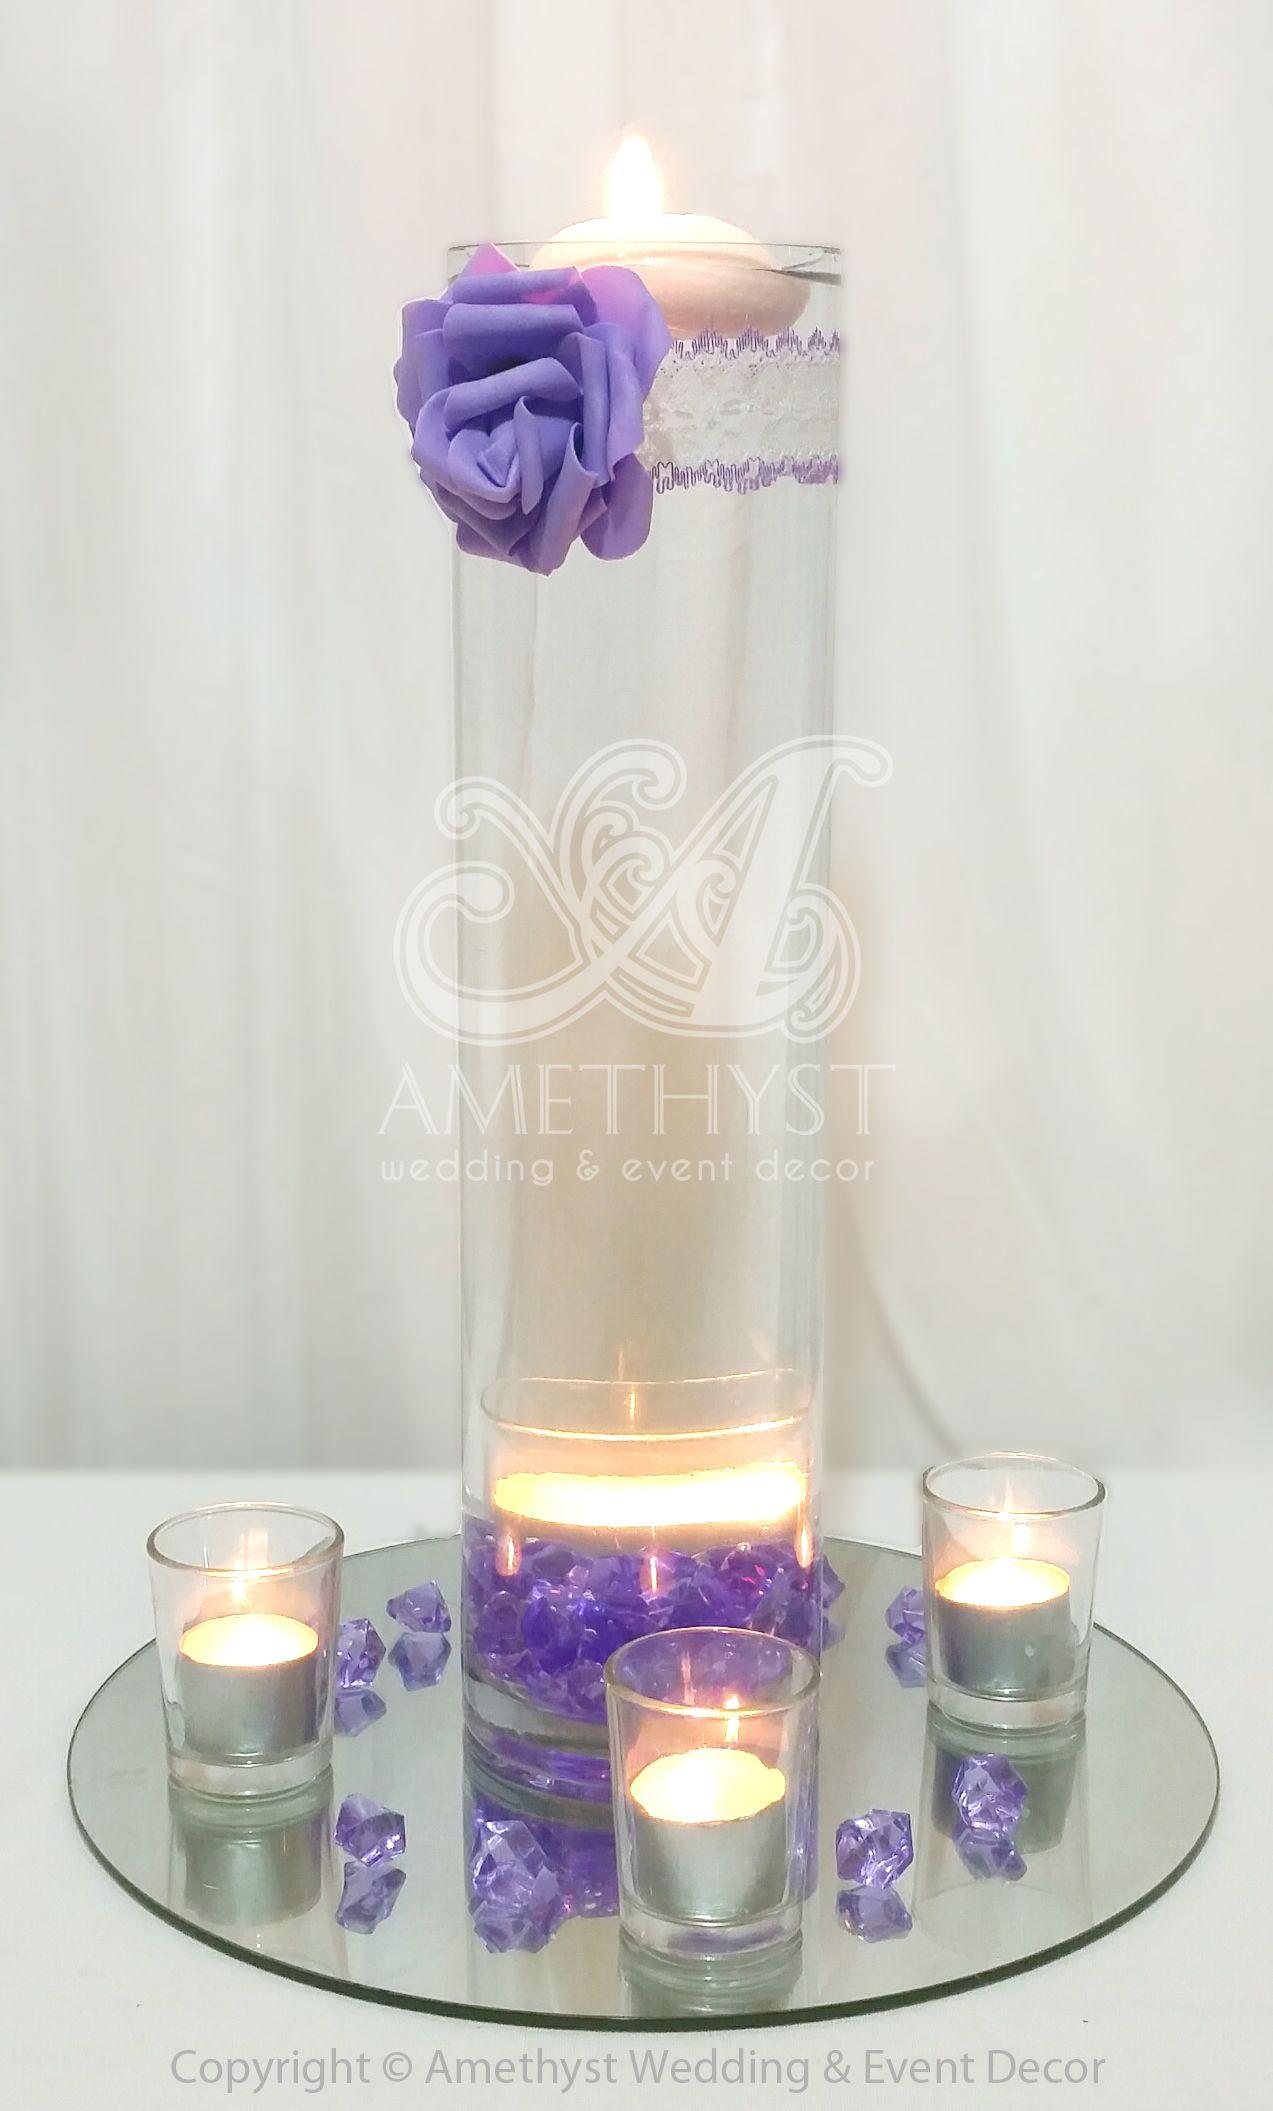 Simple elegant wedding centerpiece cm cylinder vase